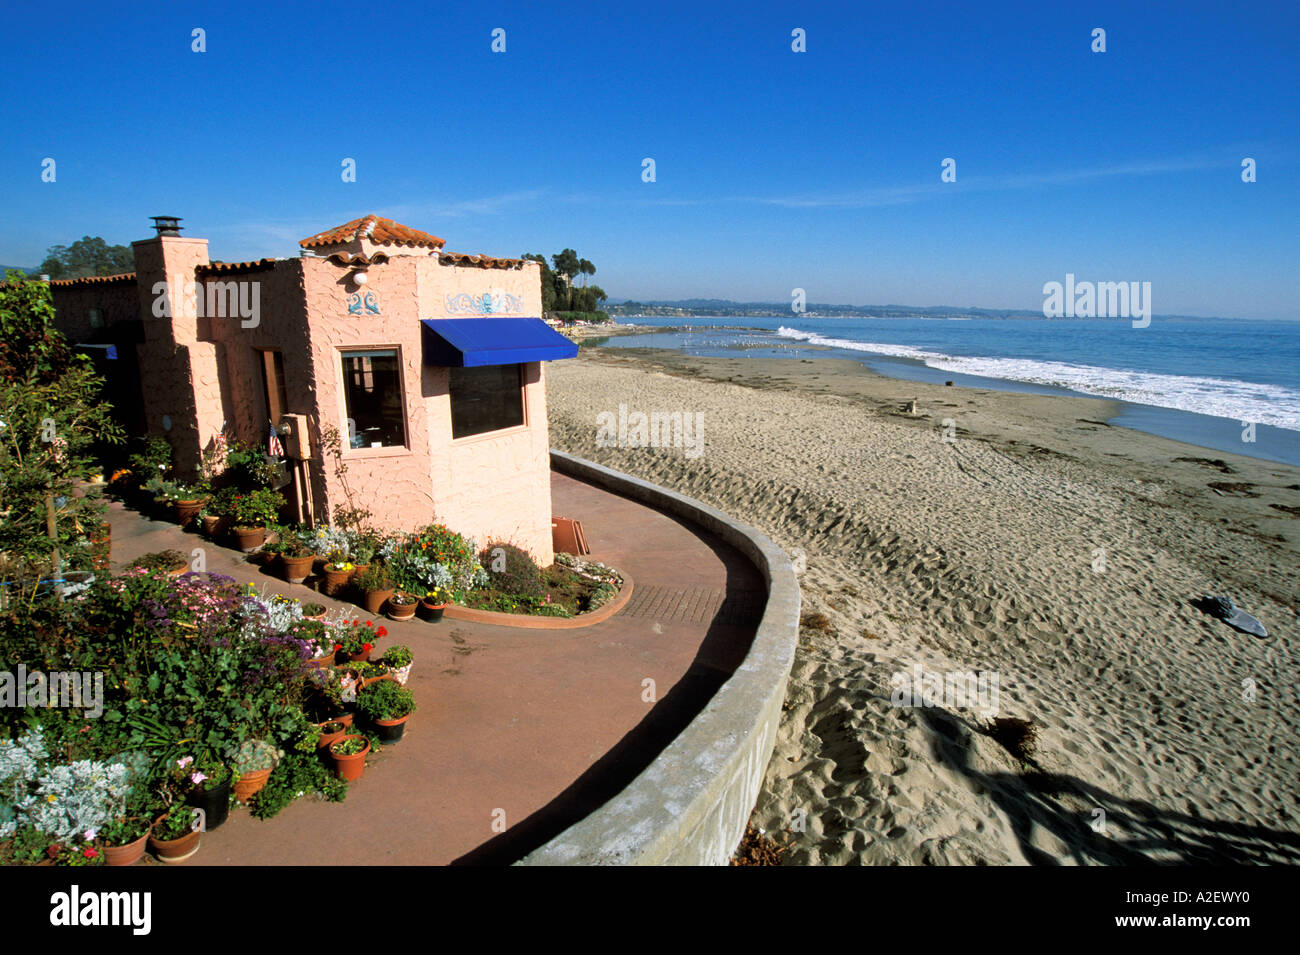 CA Beach houses at Aptos near Santa Cruz - Stock Image